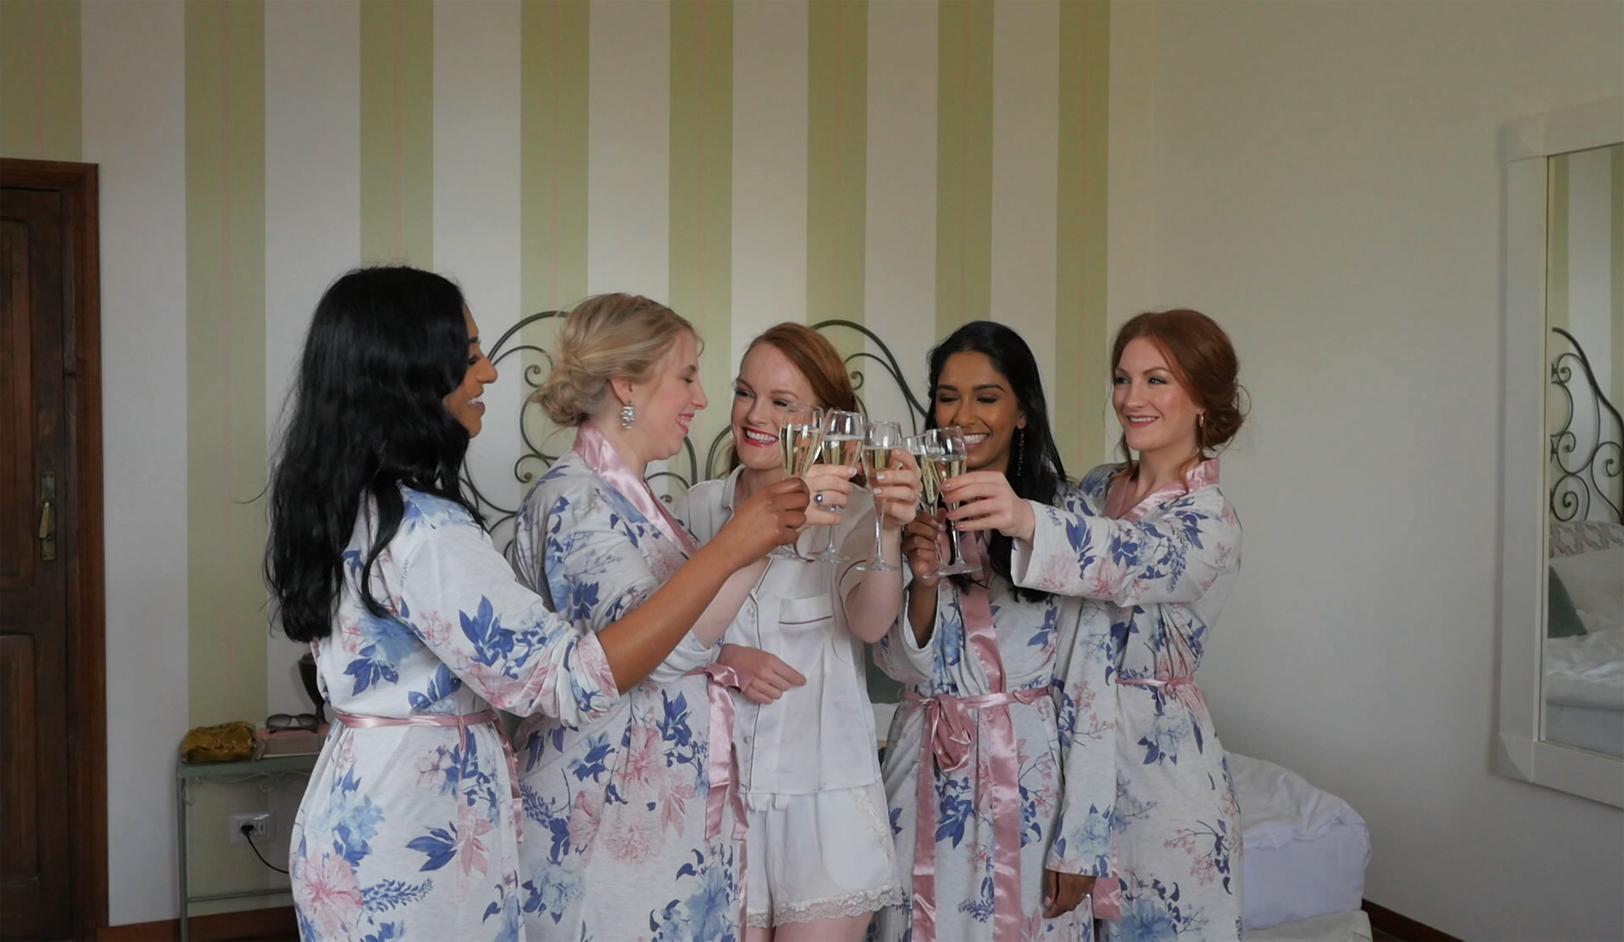 bride-bridesmaids-wedding-indian-borgo-of-tragliata.jpg